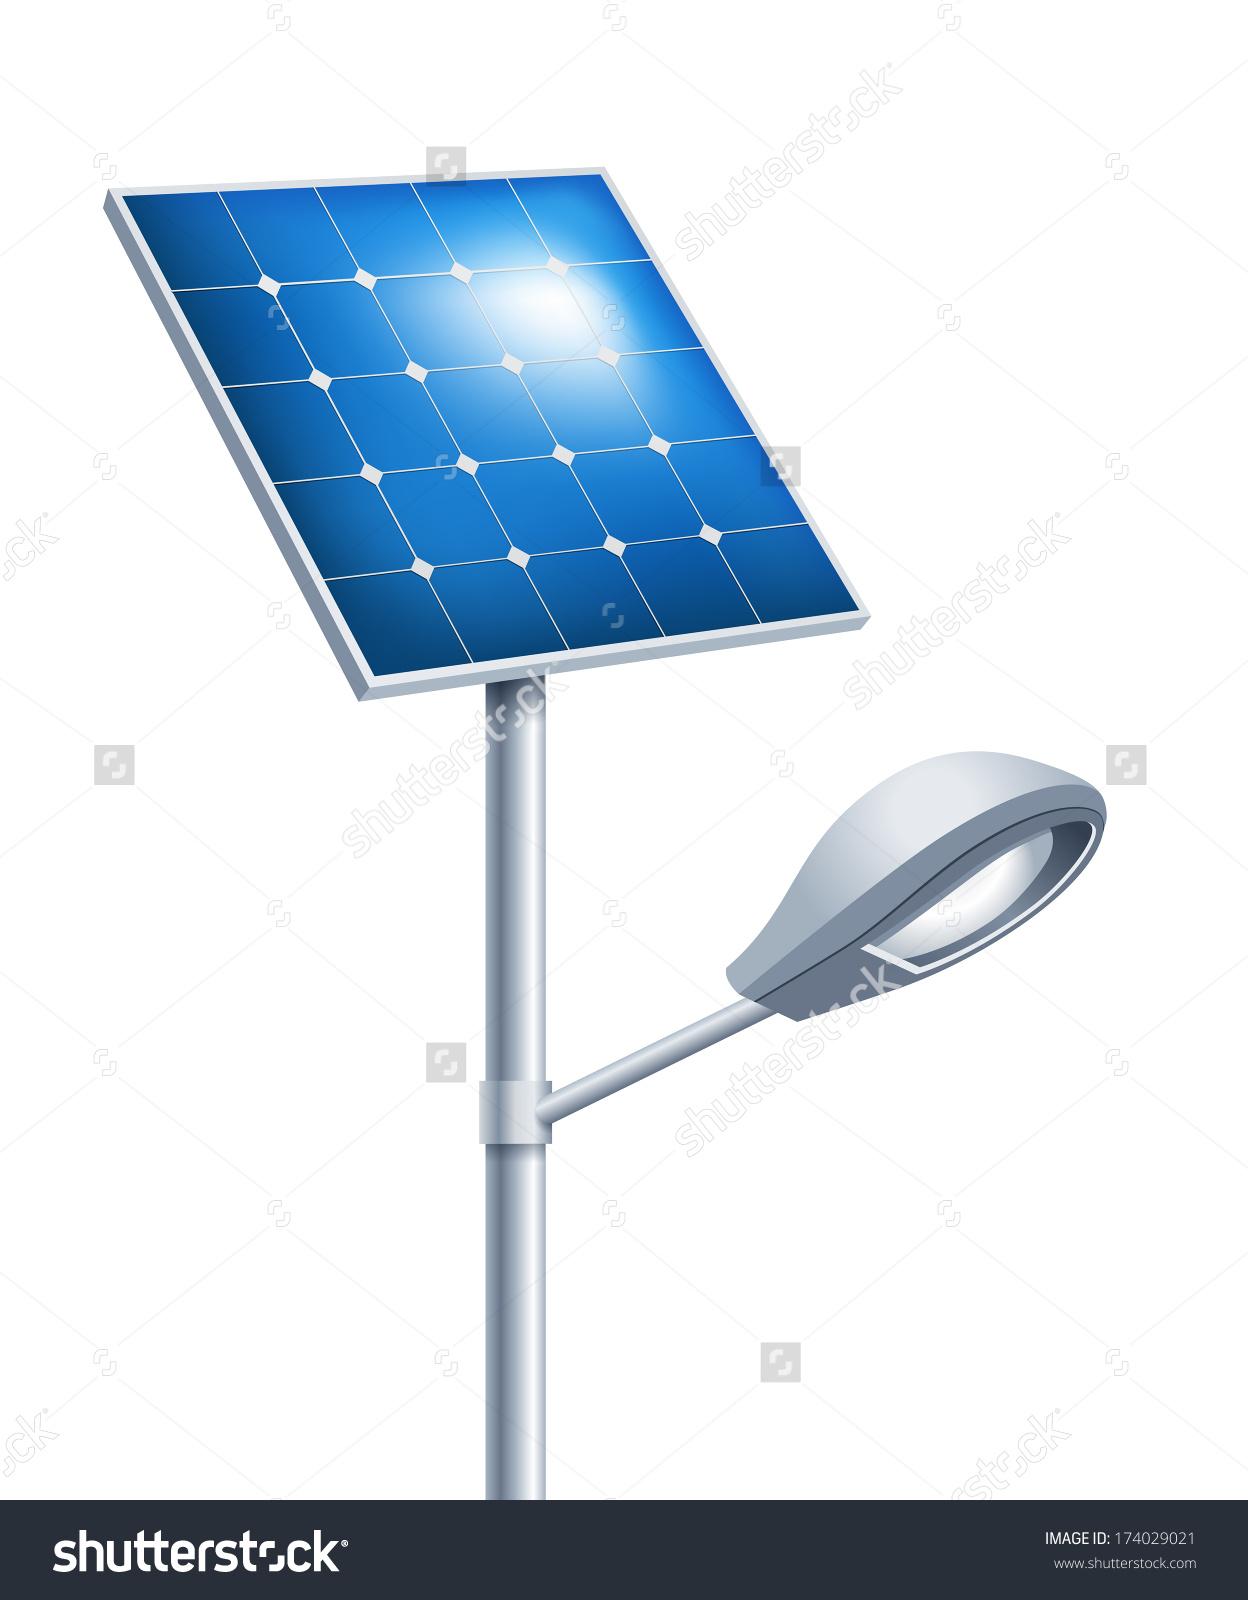 Solar Street Lamp Stock Vector 174029021.